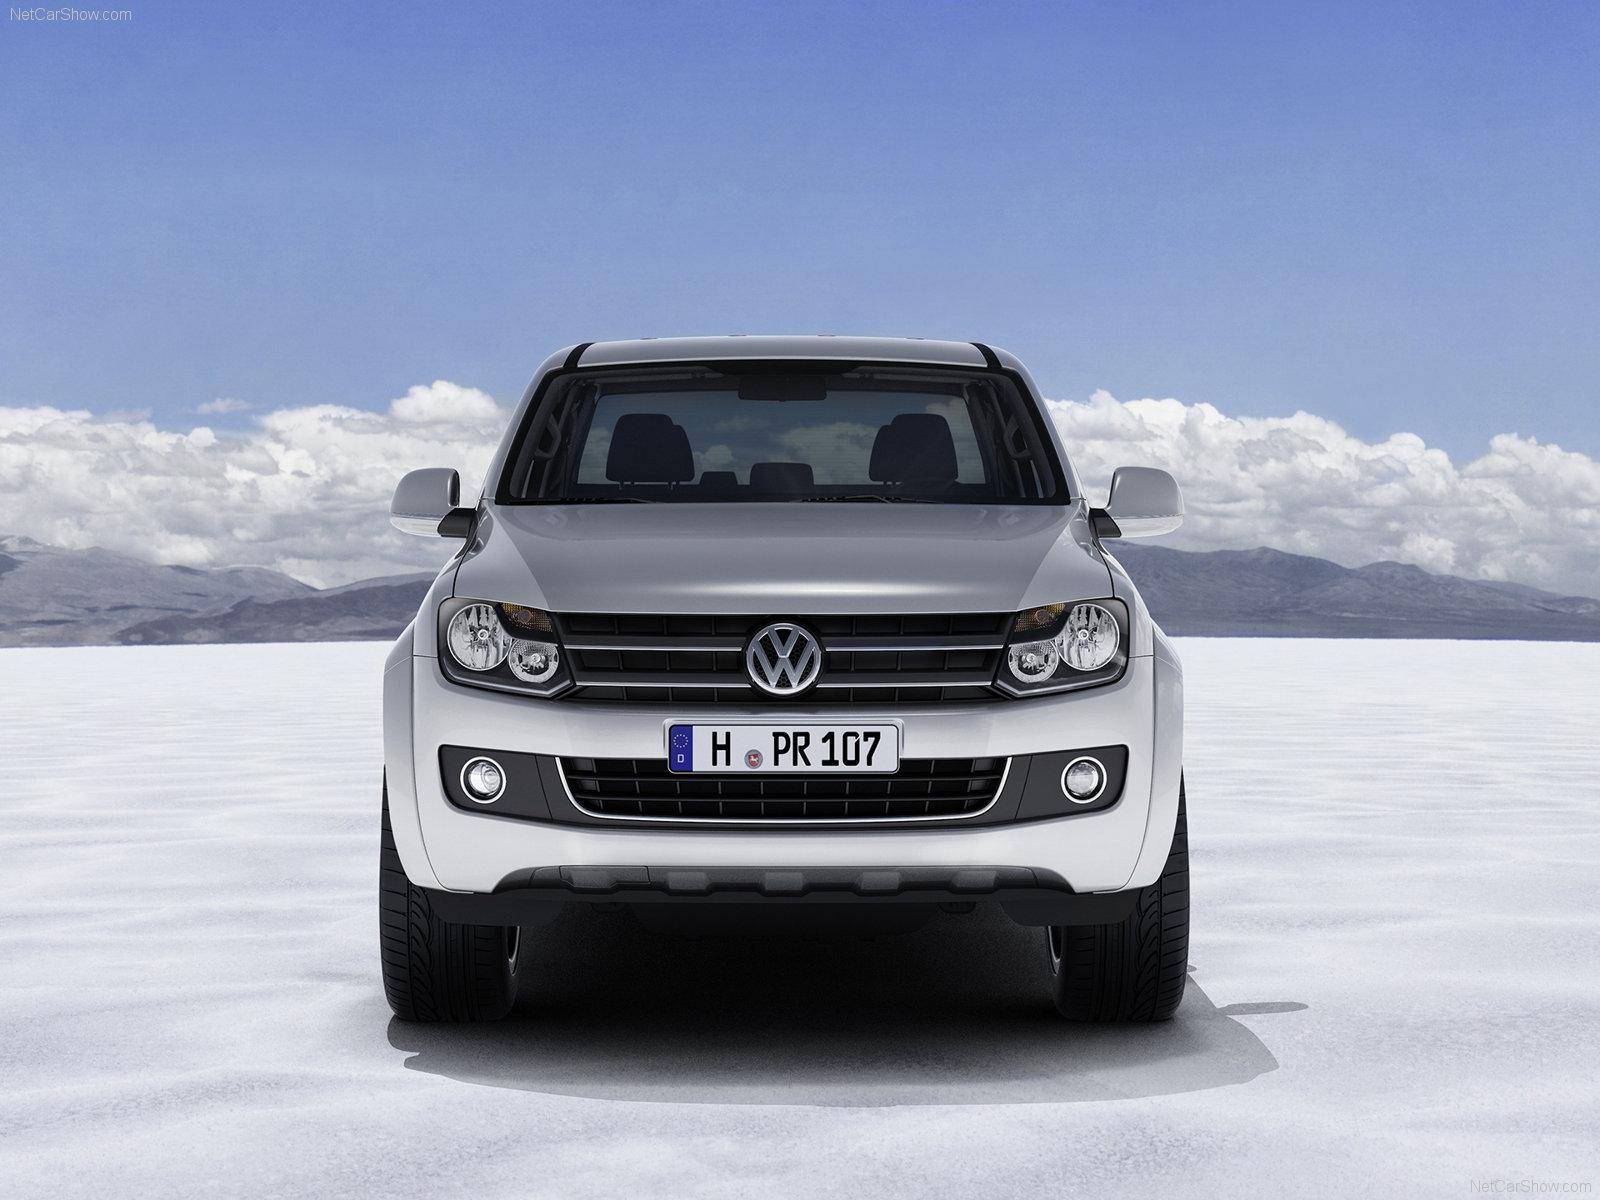 http://1.bp.blogspot.com/_Y5-4Z4aPcOI/TTa-eW3iZVI/AAAAAAAAAUI/8cs0mRbXHlE/s1600/Volkswagen-Amarok_2011_1600x1200_wallpaper_03.jpg